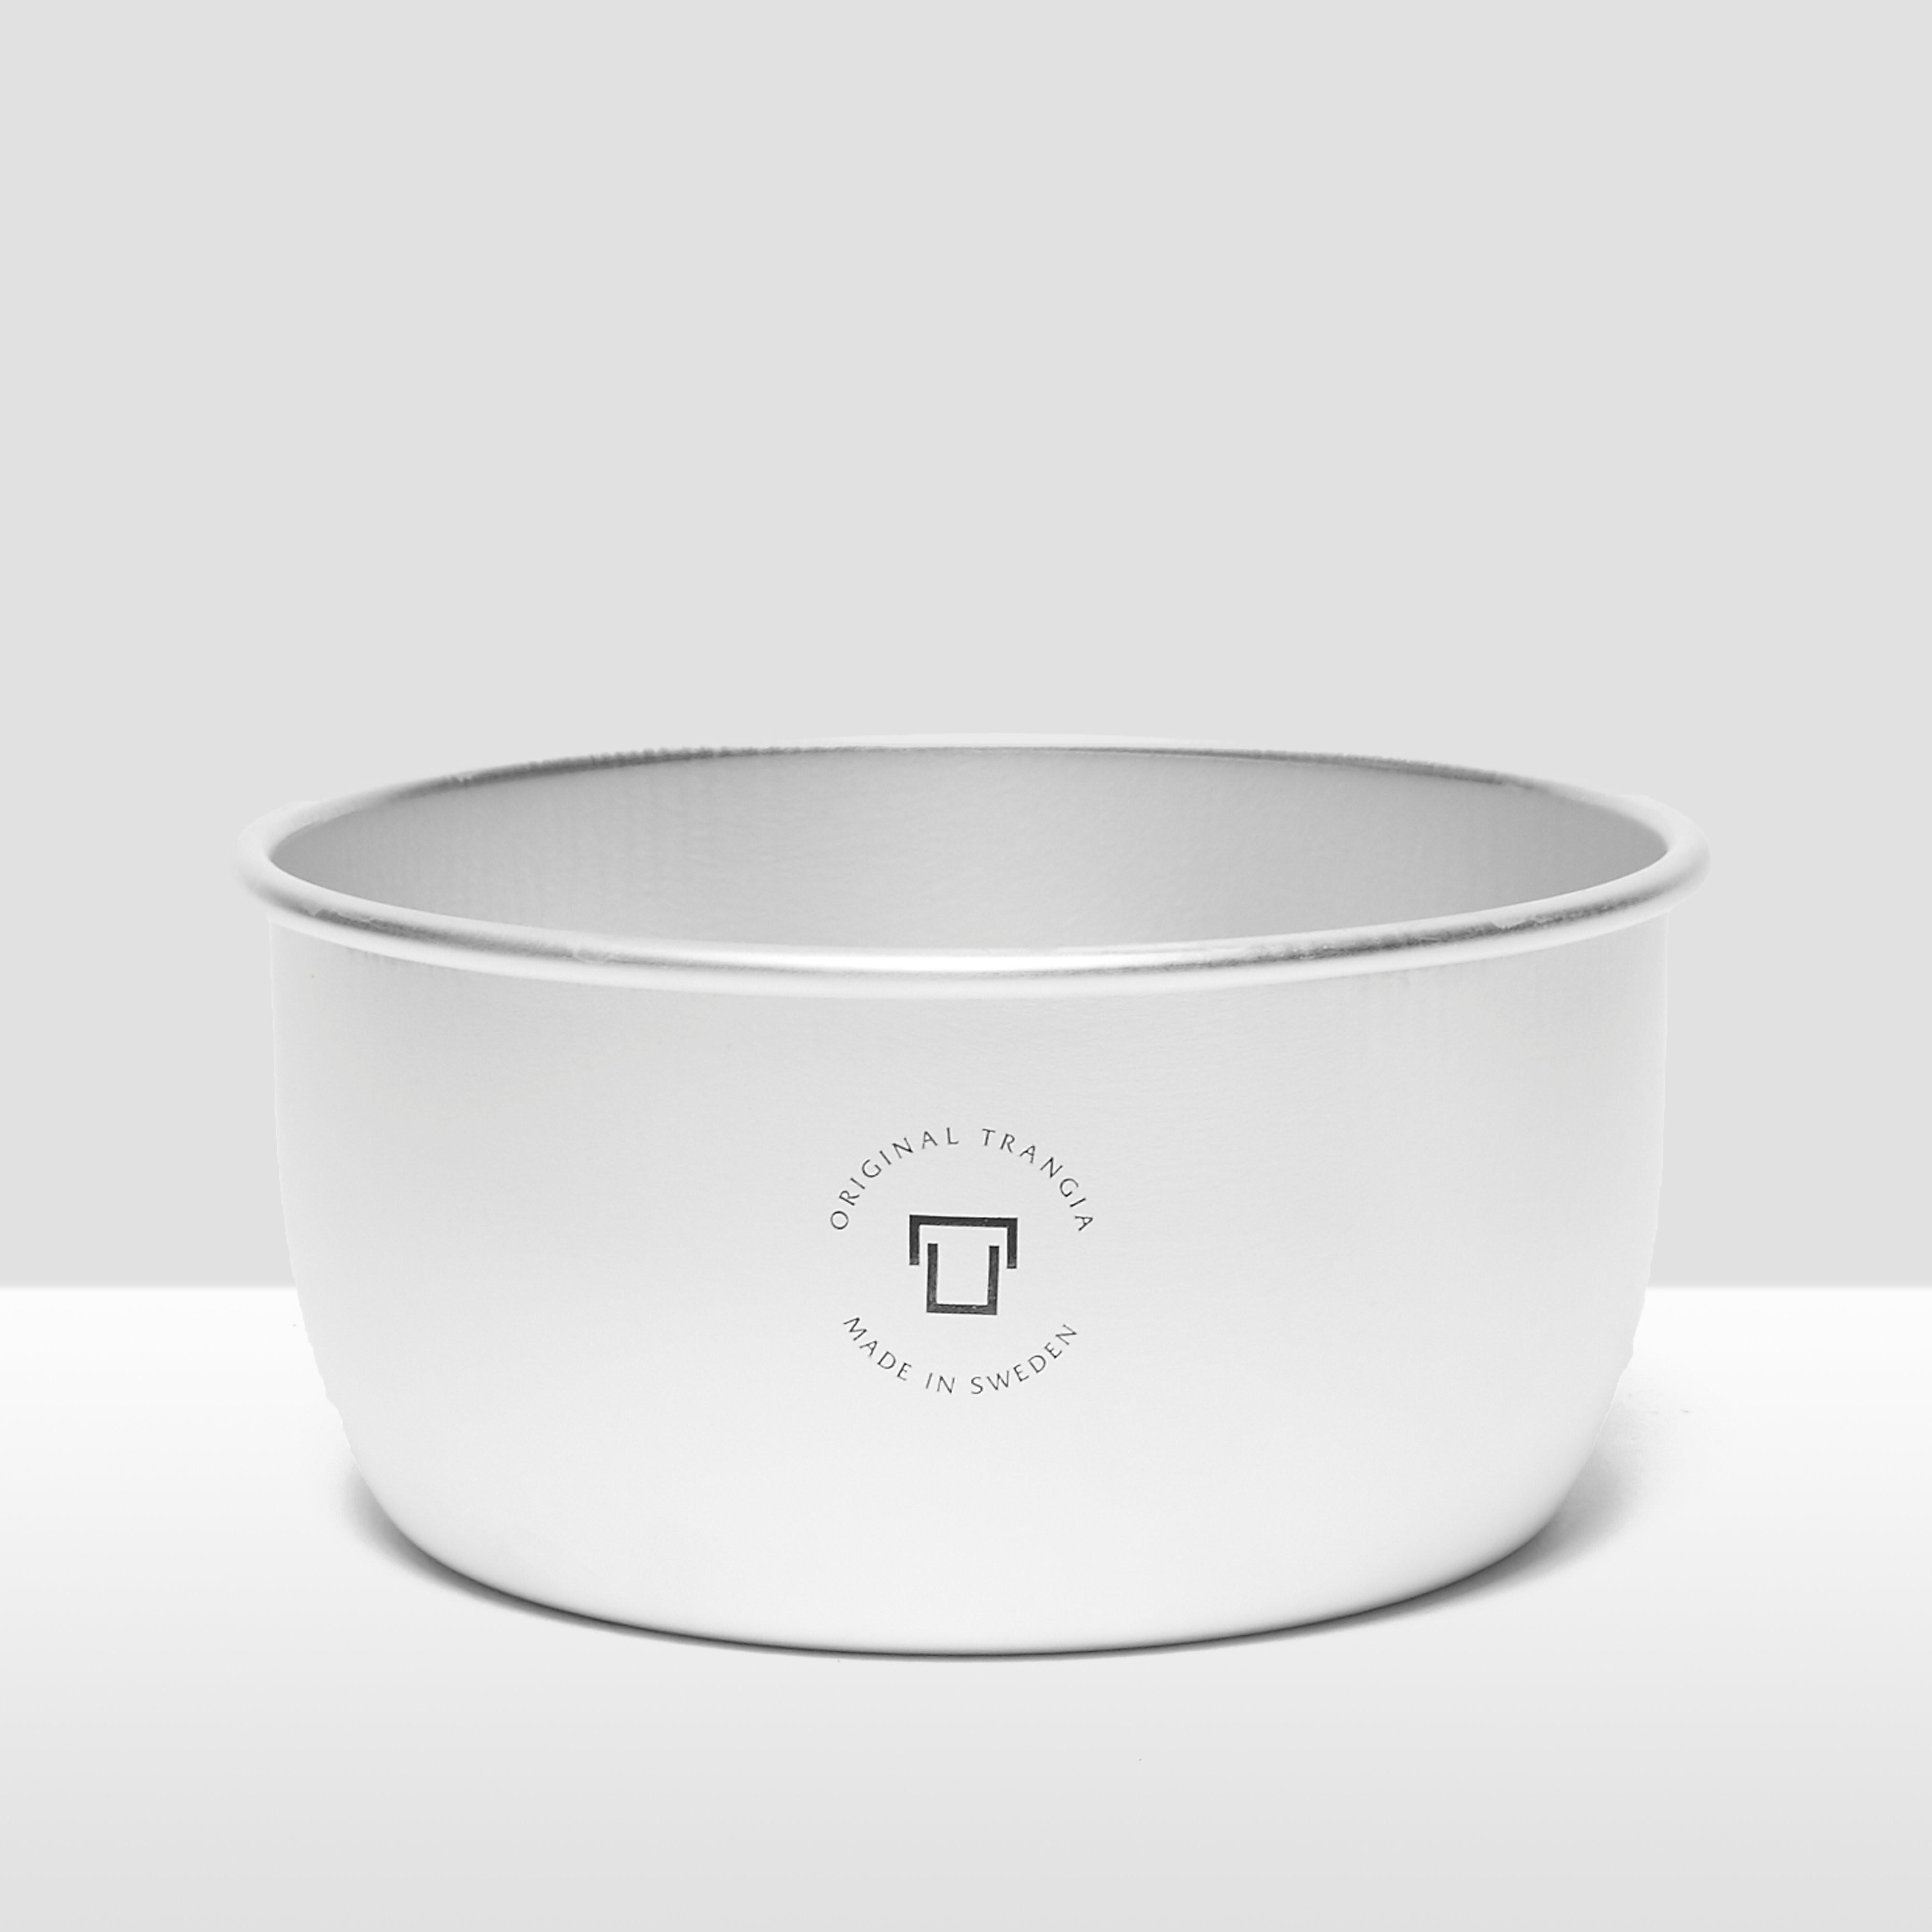 TRANGIA 1L Graded Inner Aluminium Saucepan